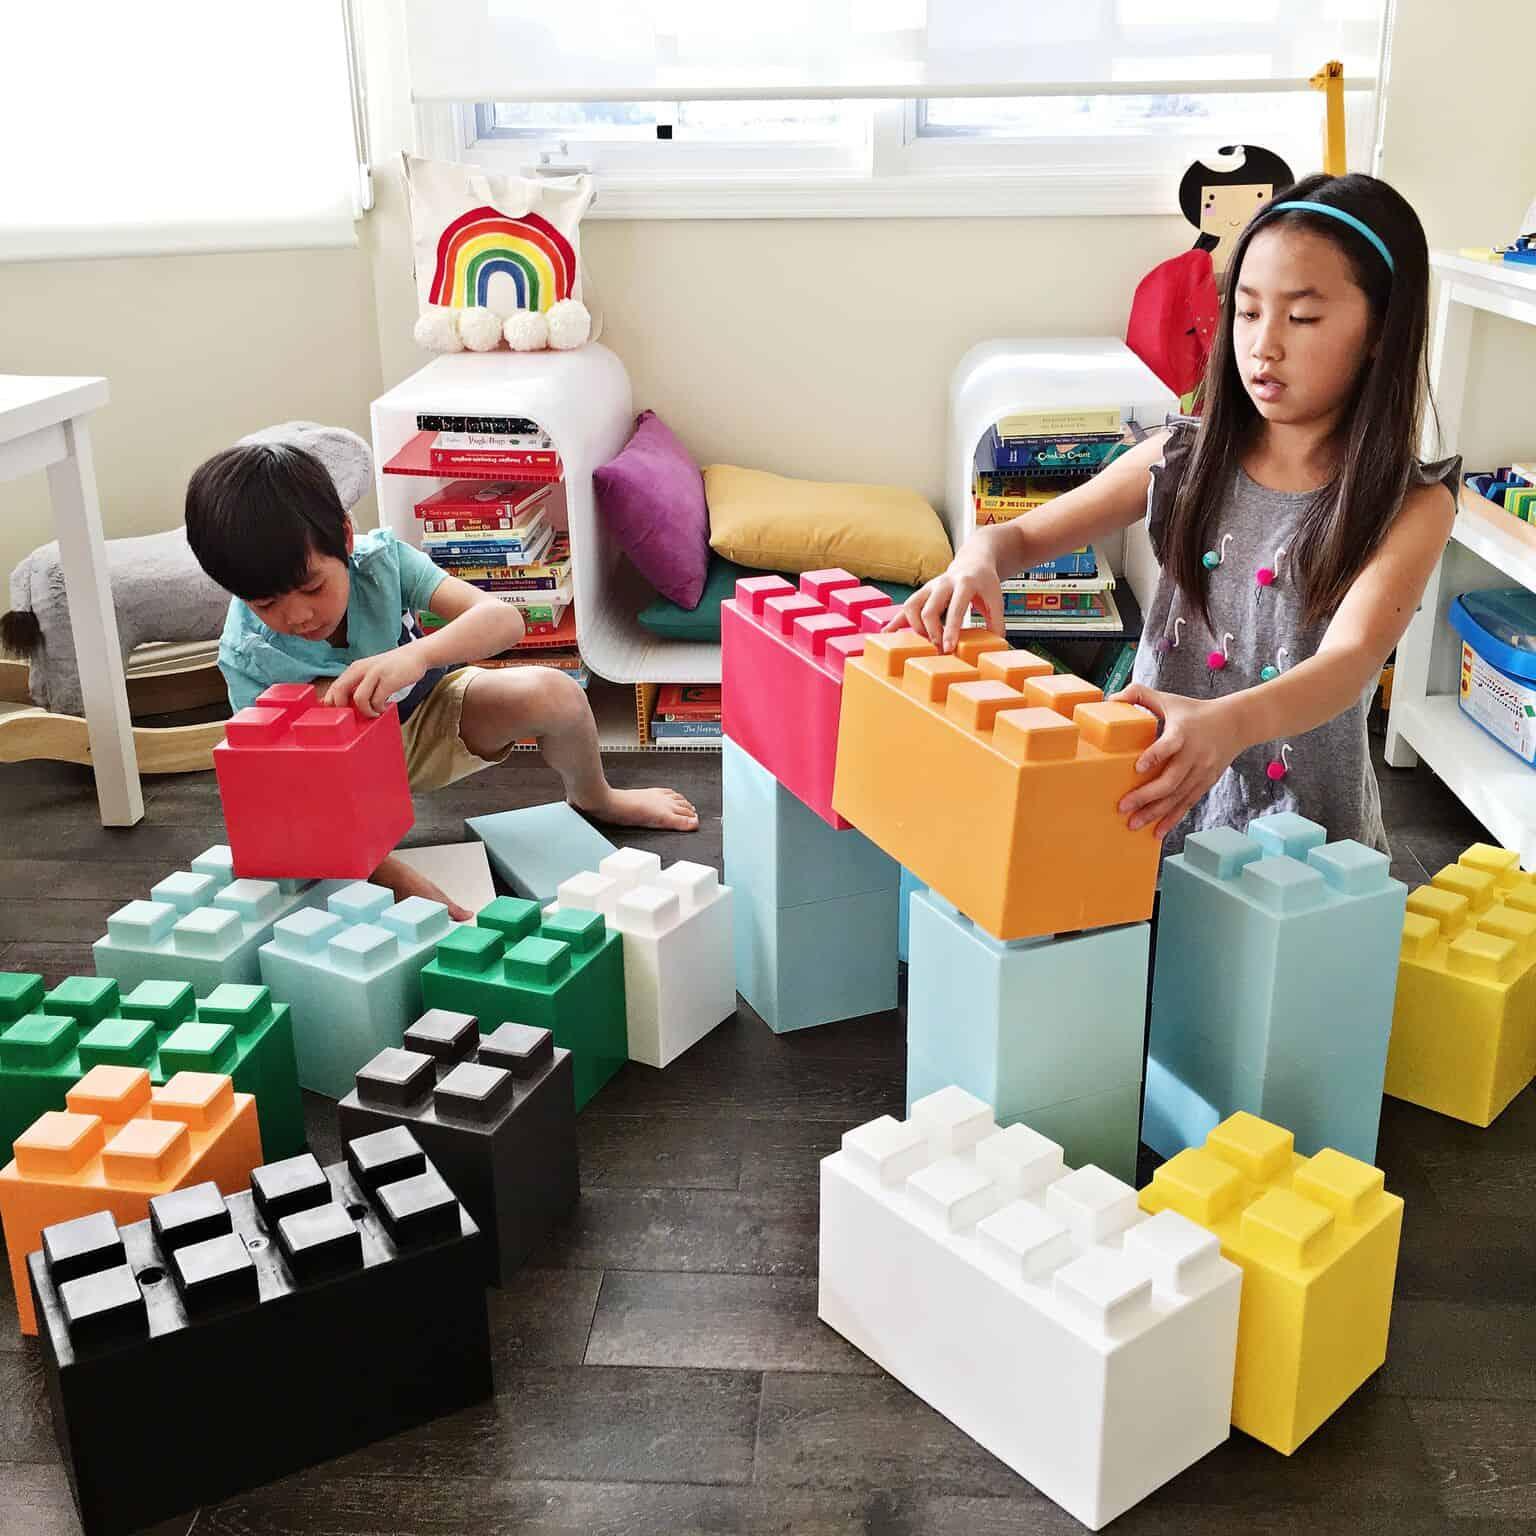 Giant Lego Like Building Block Toys For Kids Hello Wonderful